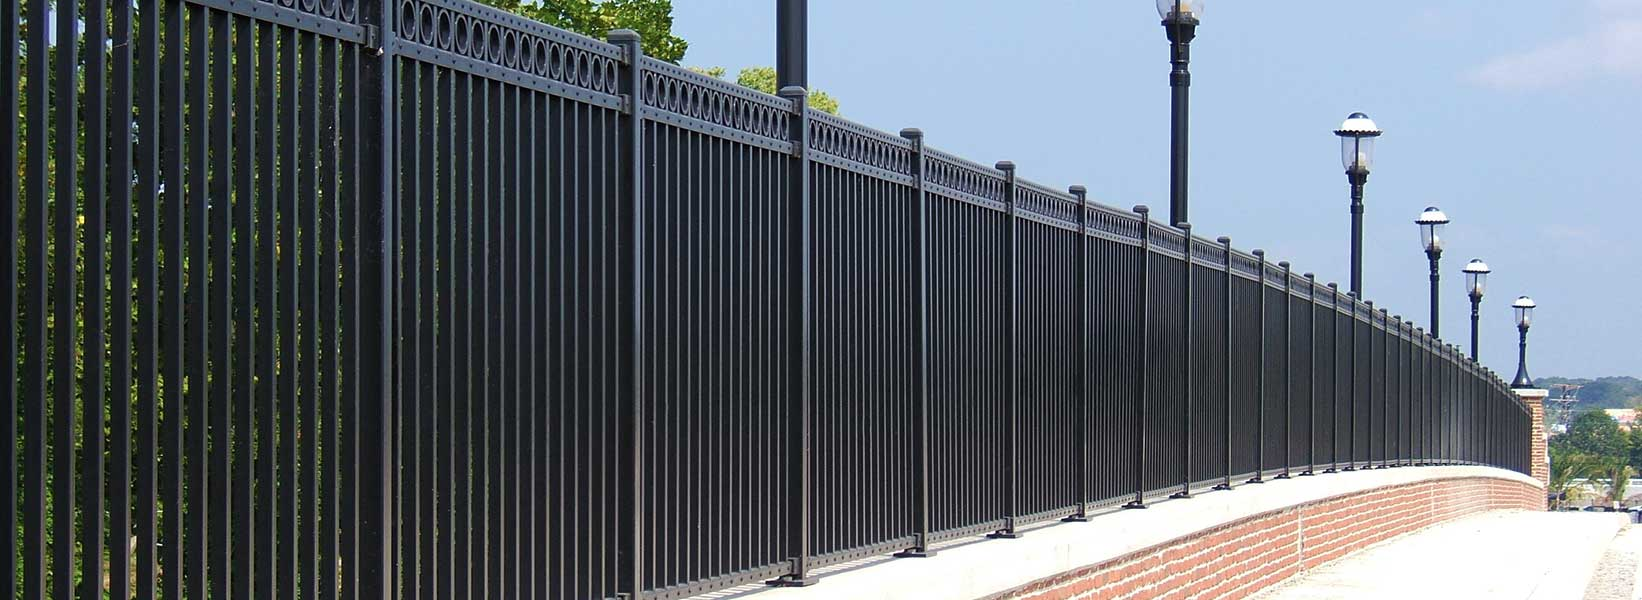 Sl industrial aberdeen iron panels world fencing